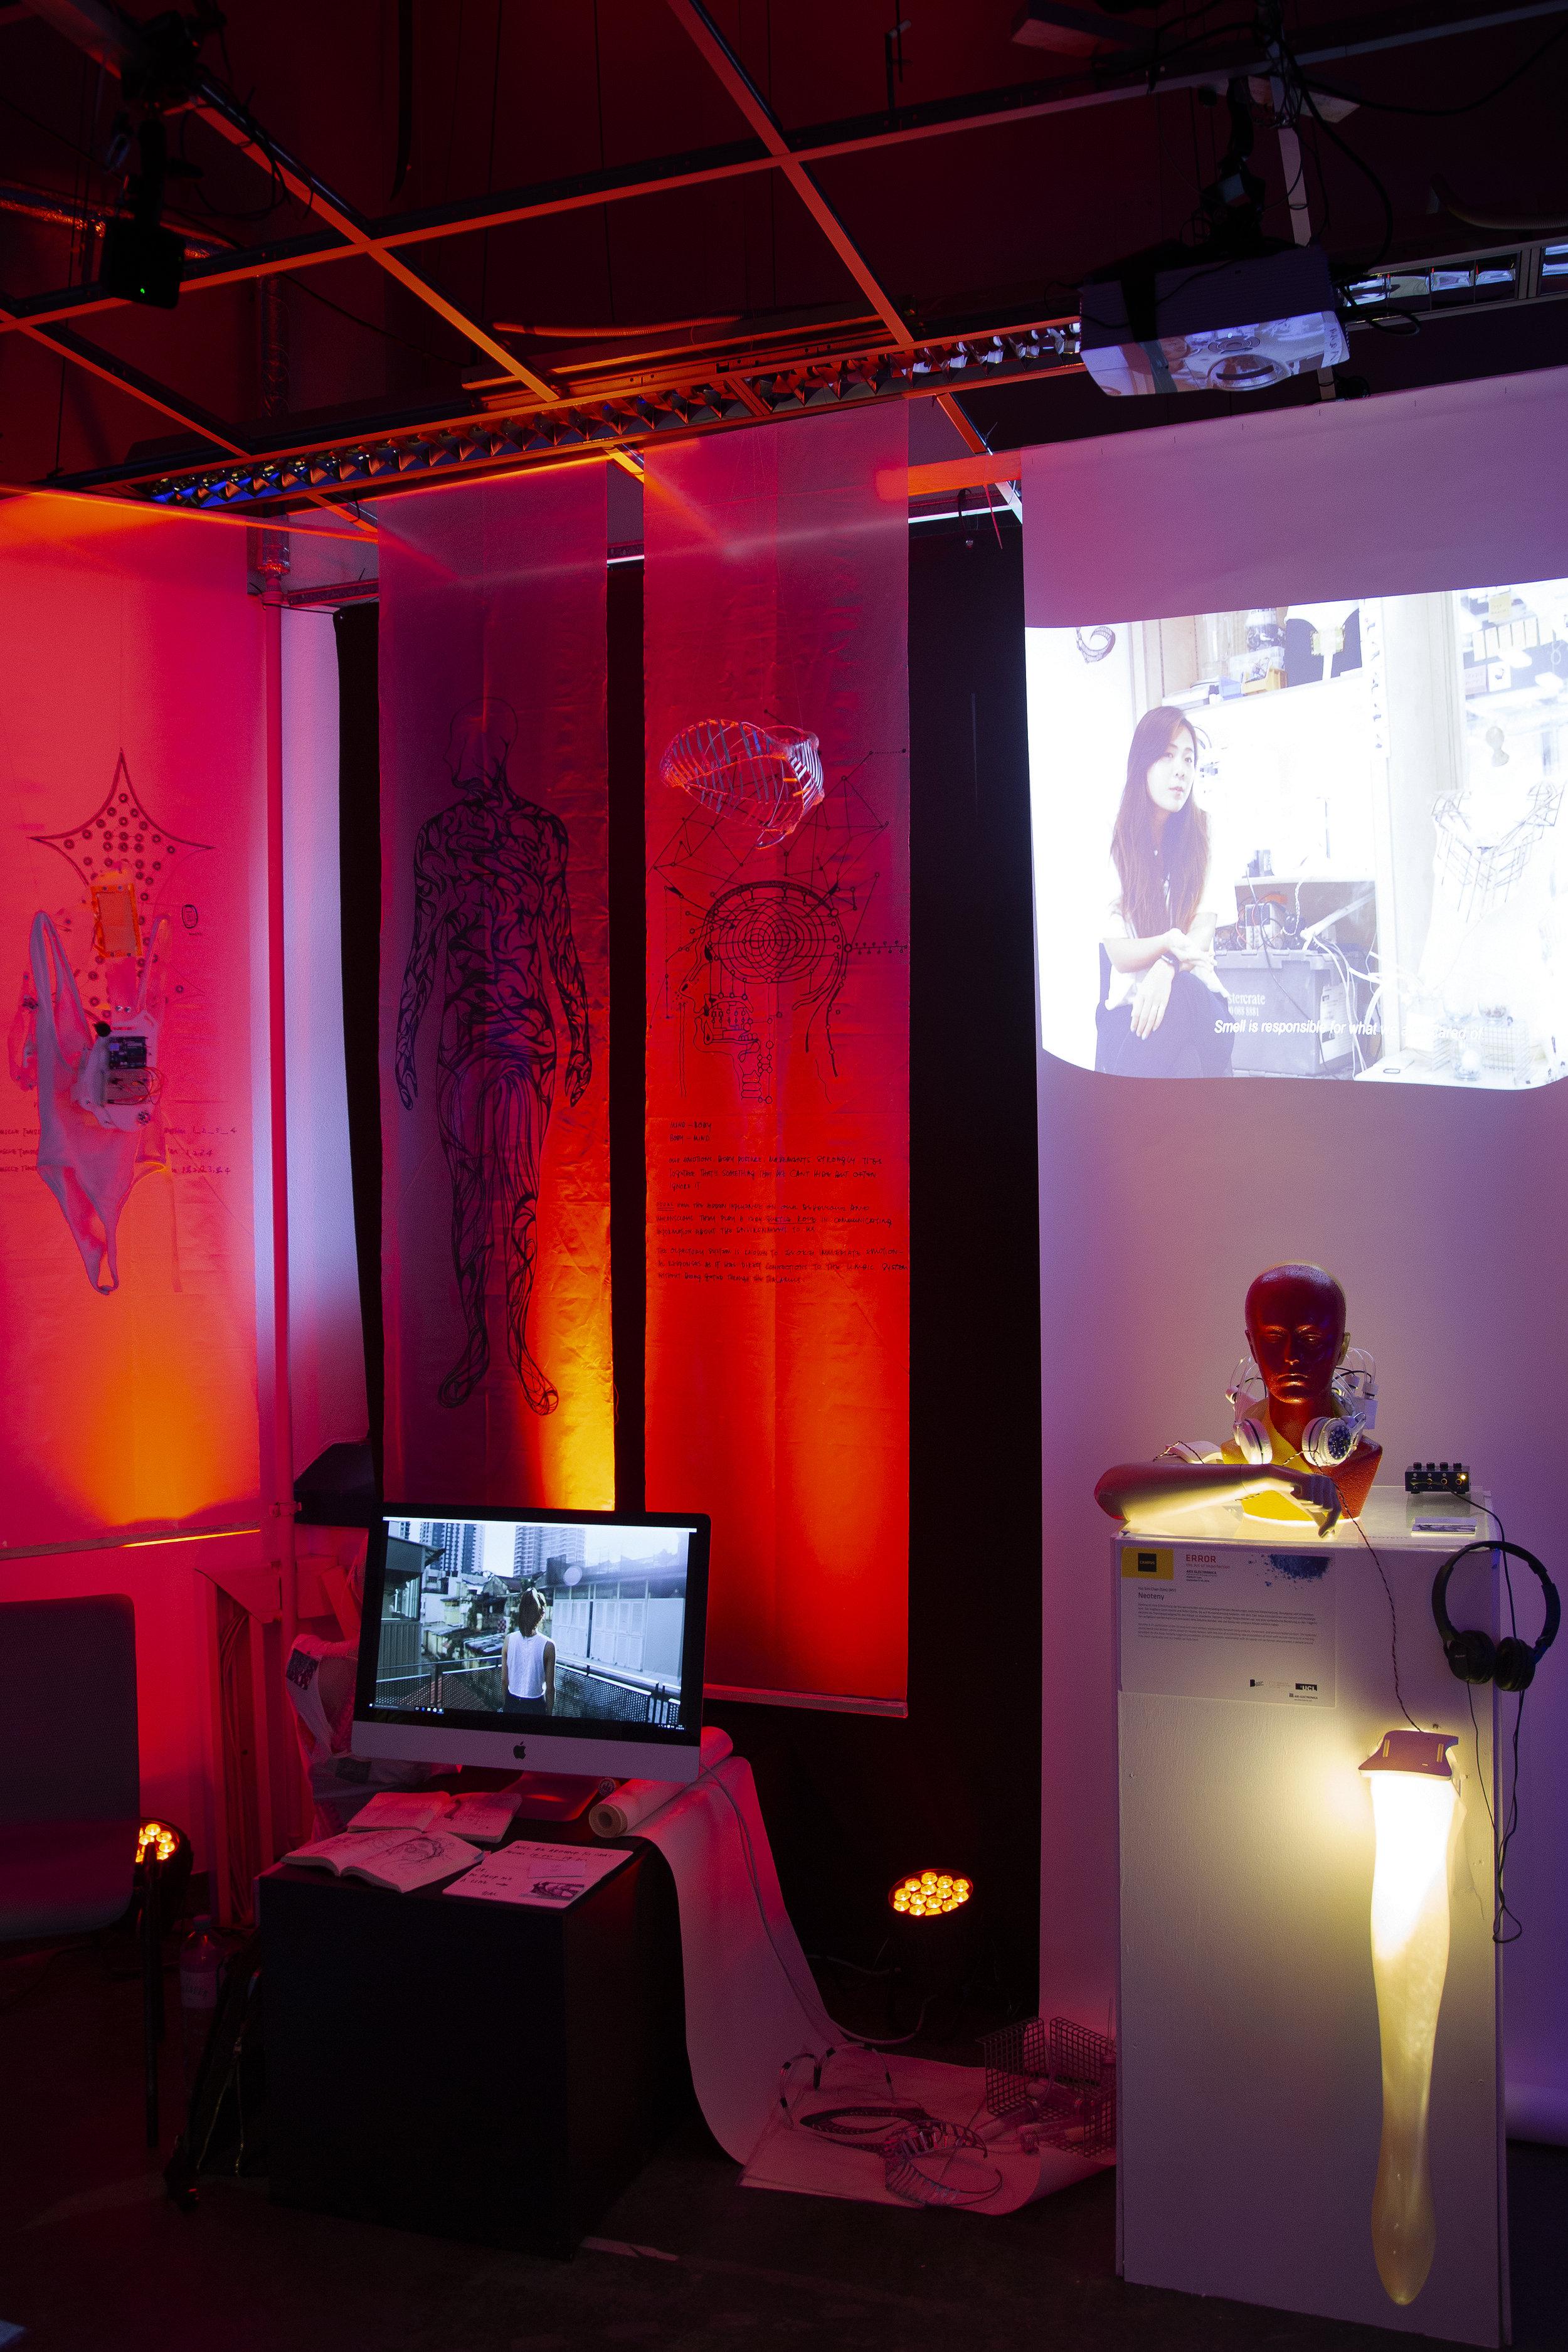 Ars Electronica 2018, Linz, Austria